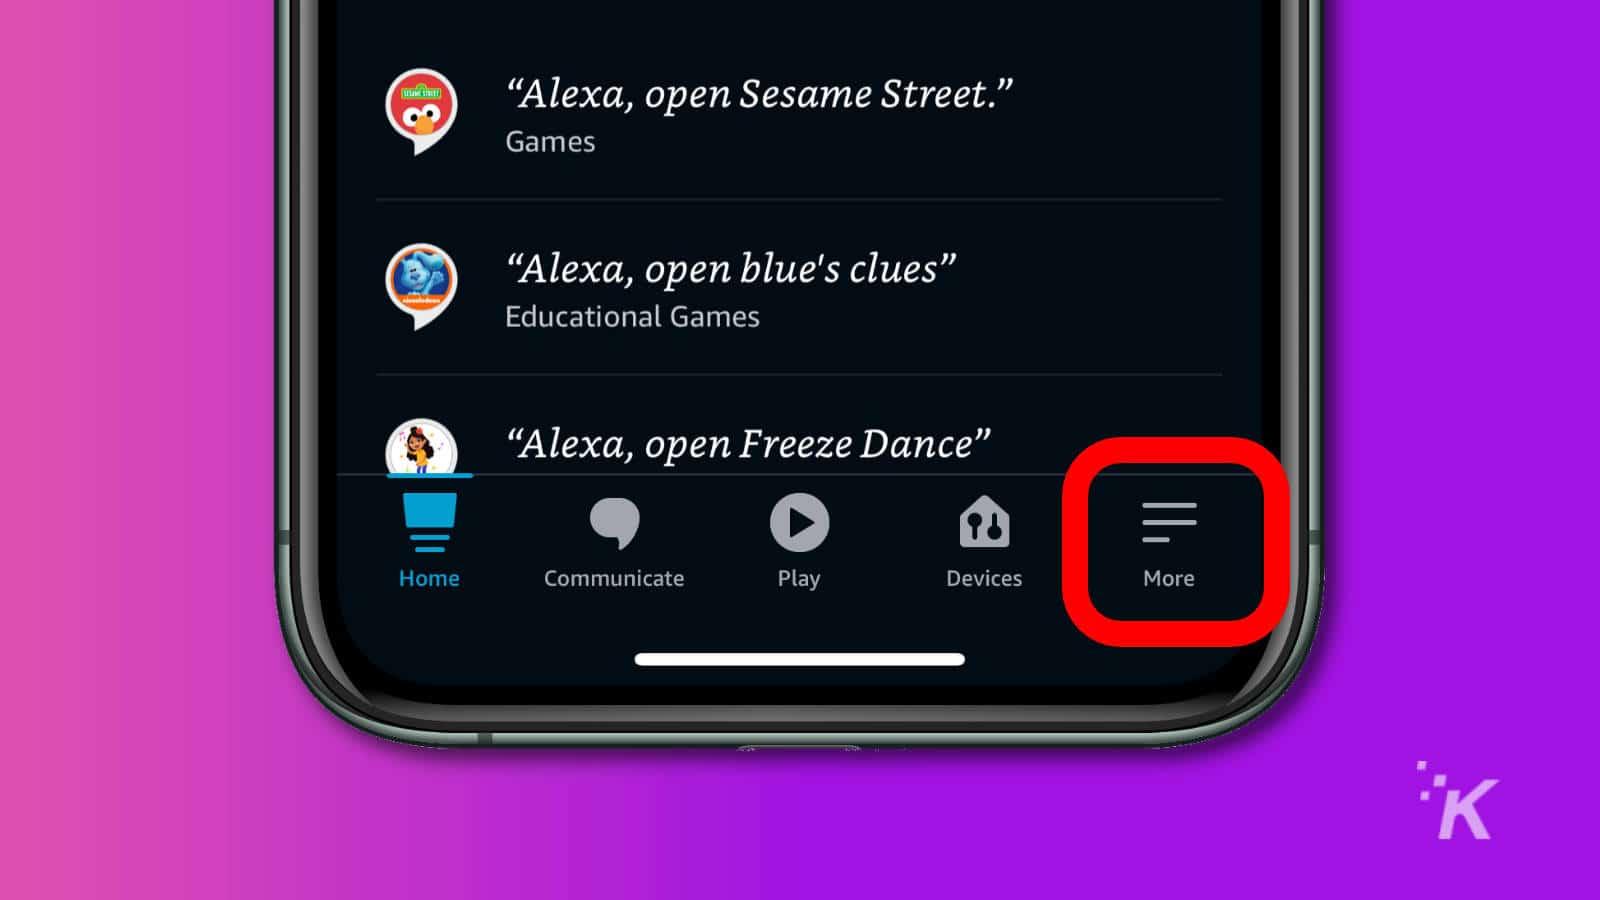 amazon alexa app showing home screen